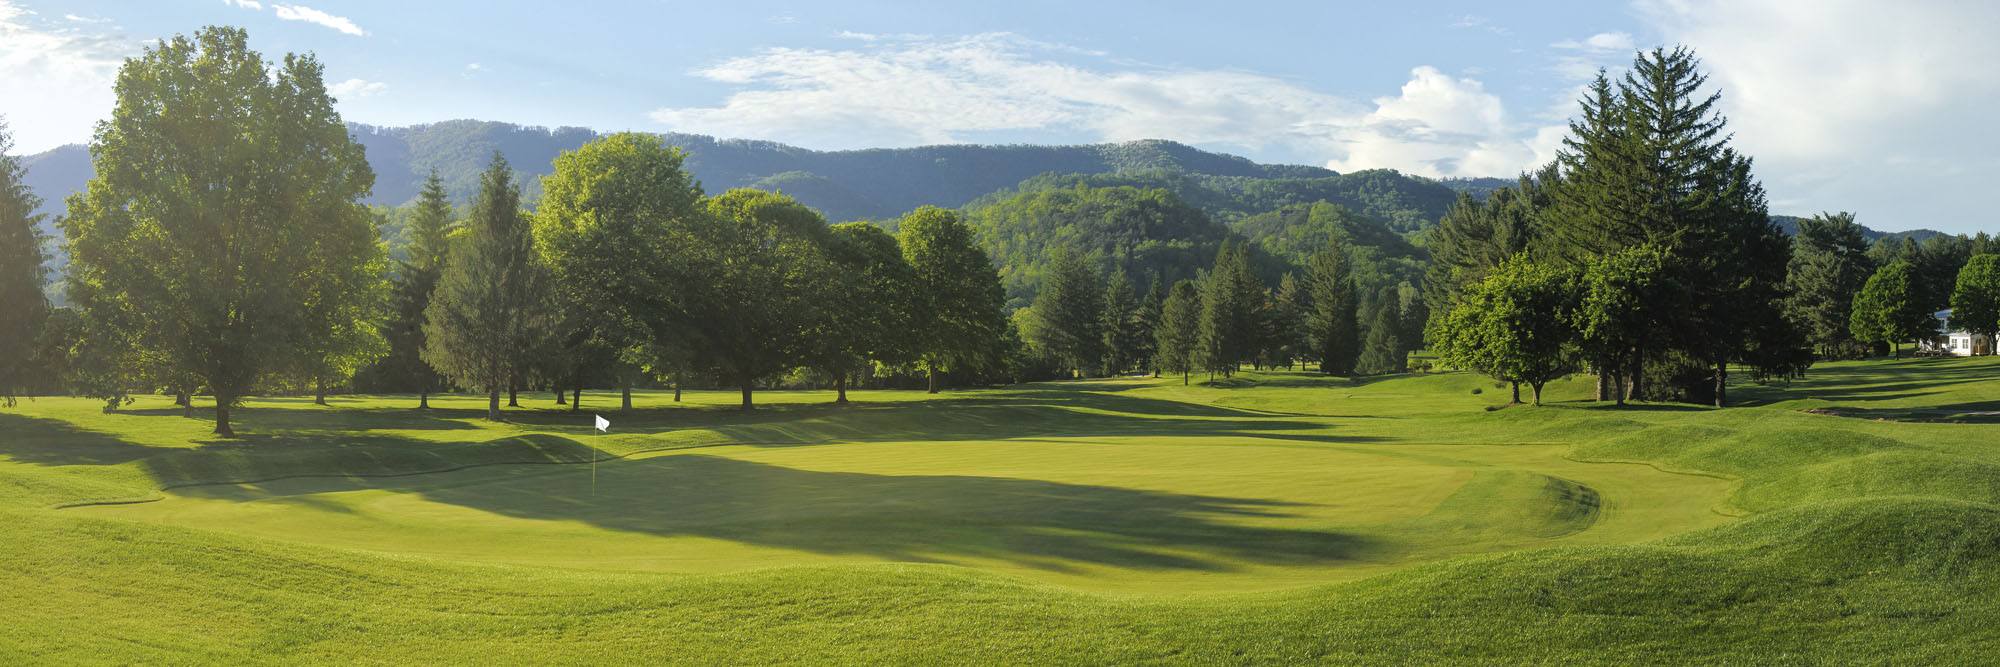 Golf Course Image - The Greenbrier Meadows Course No. 15